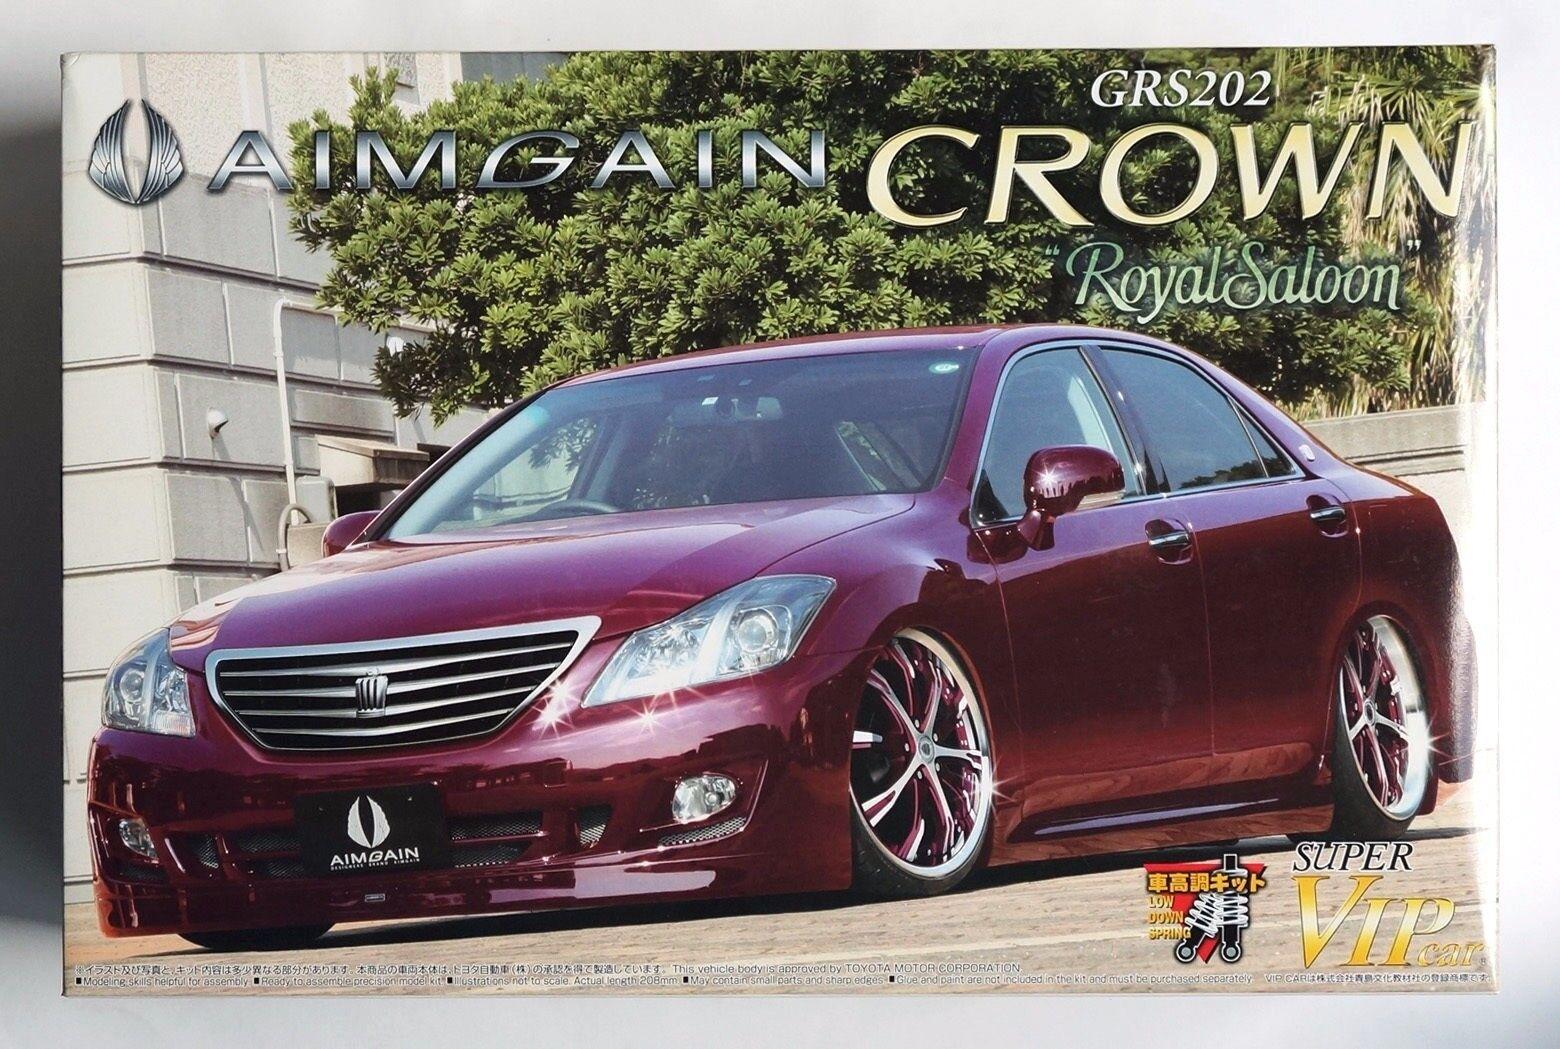 AOSHIMA 1 24 Aimgain Crown GRS202 Royal Saloon Super VIP SP model kit